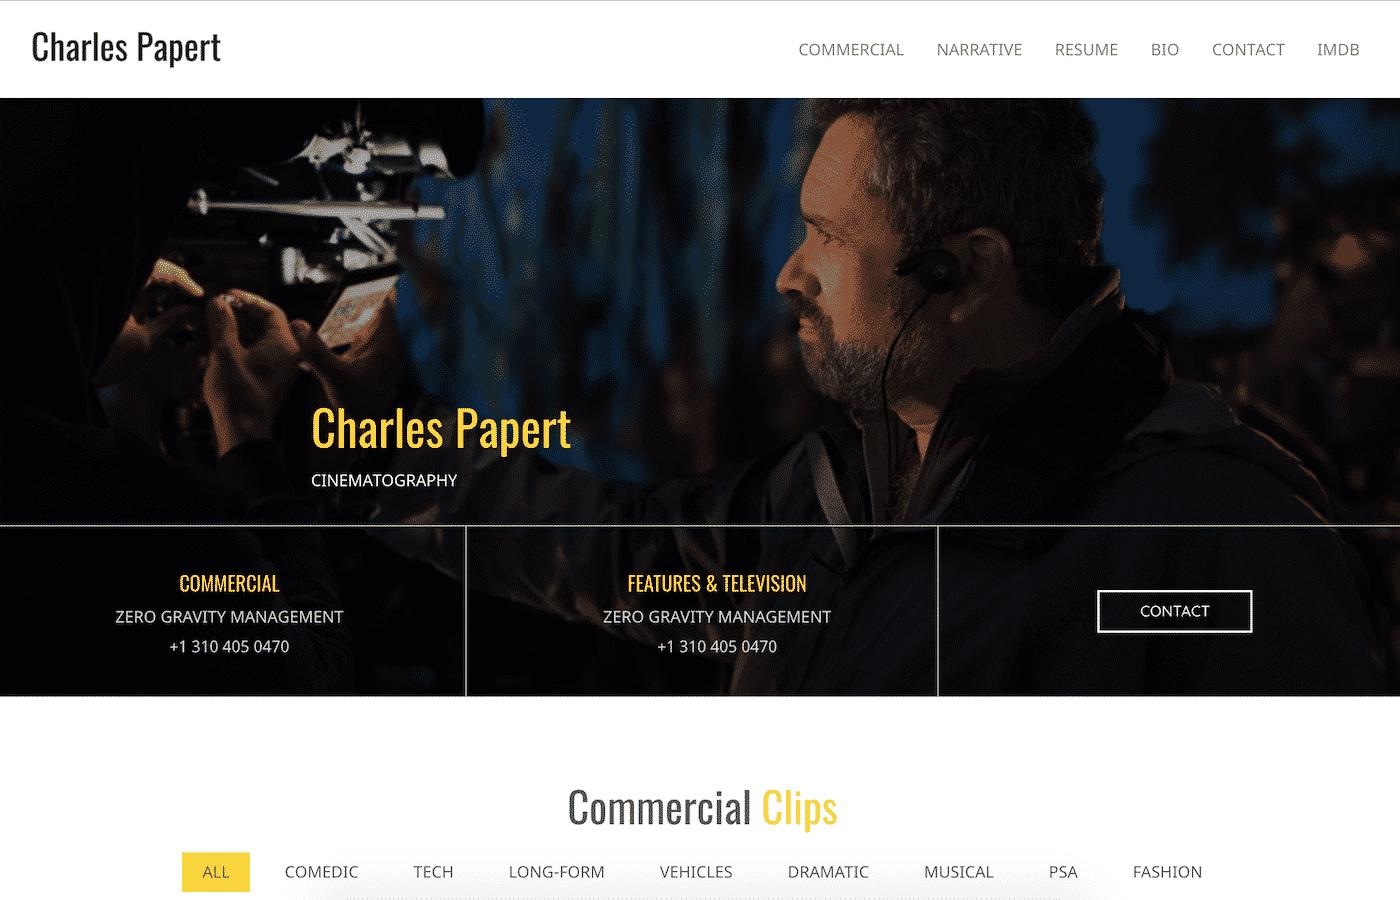 Charles Papert